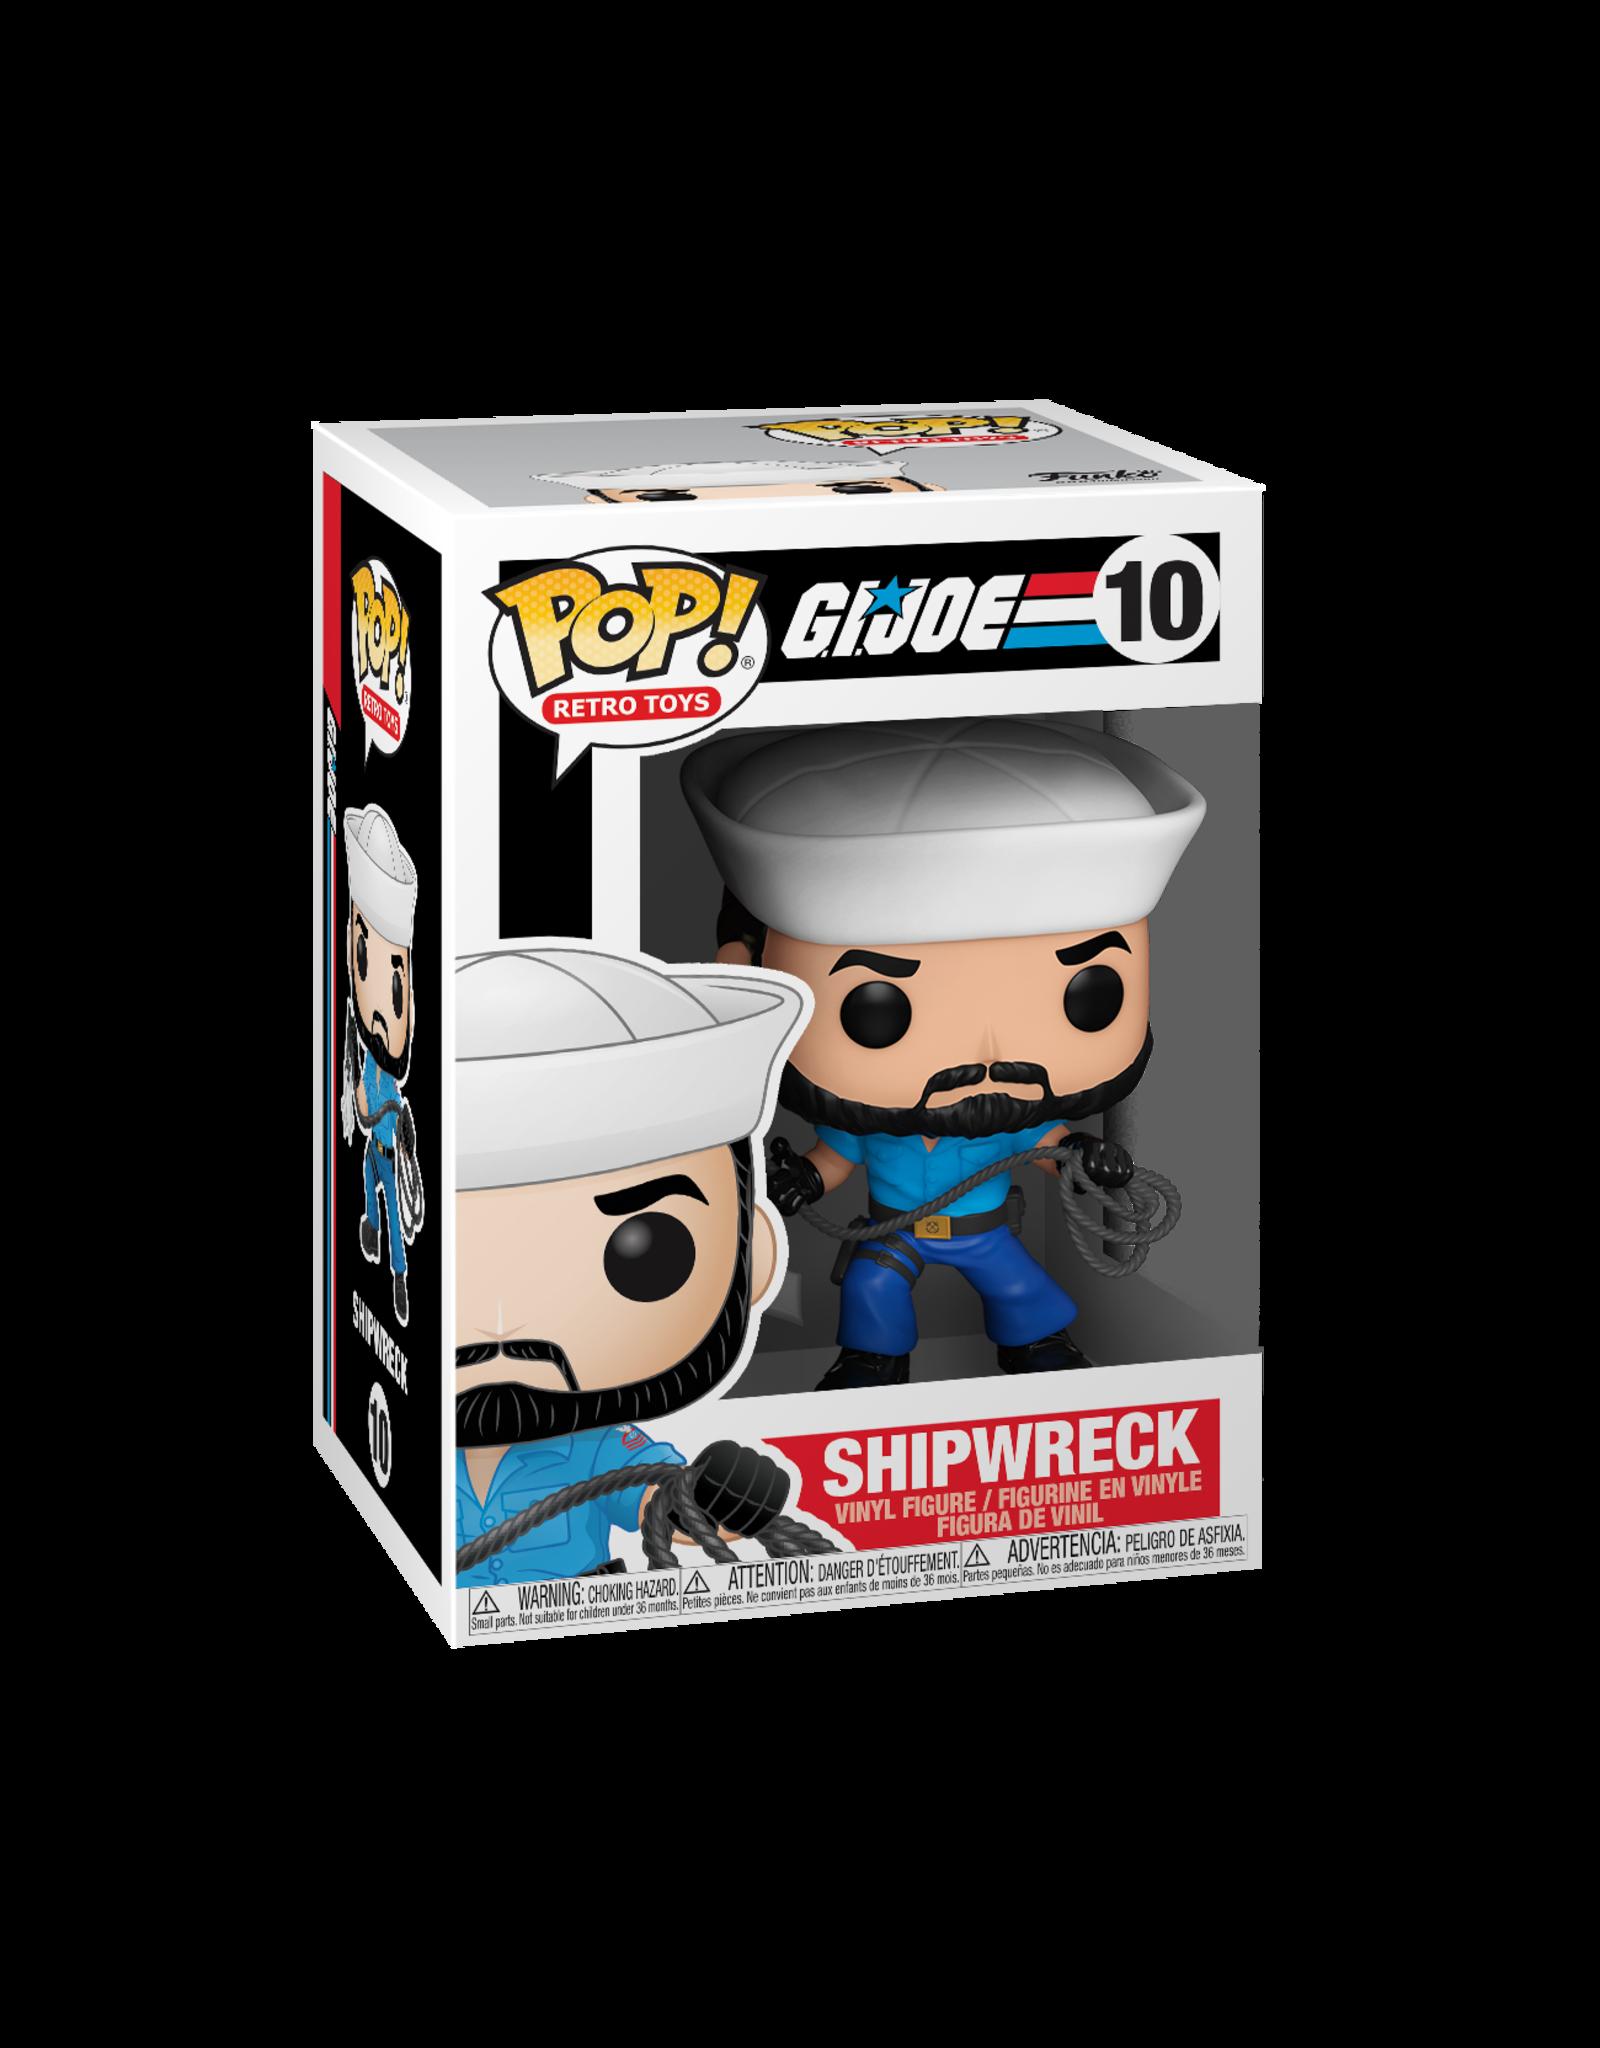 FUNKO POP! G.I. JOE SHIPWRECK VINYL FIGURE